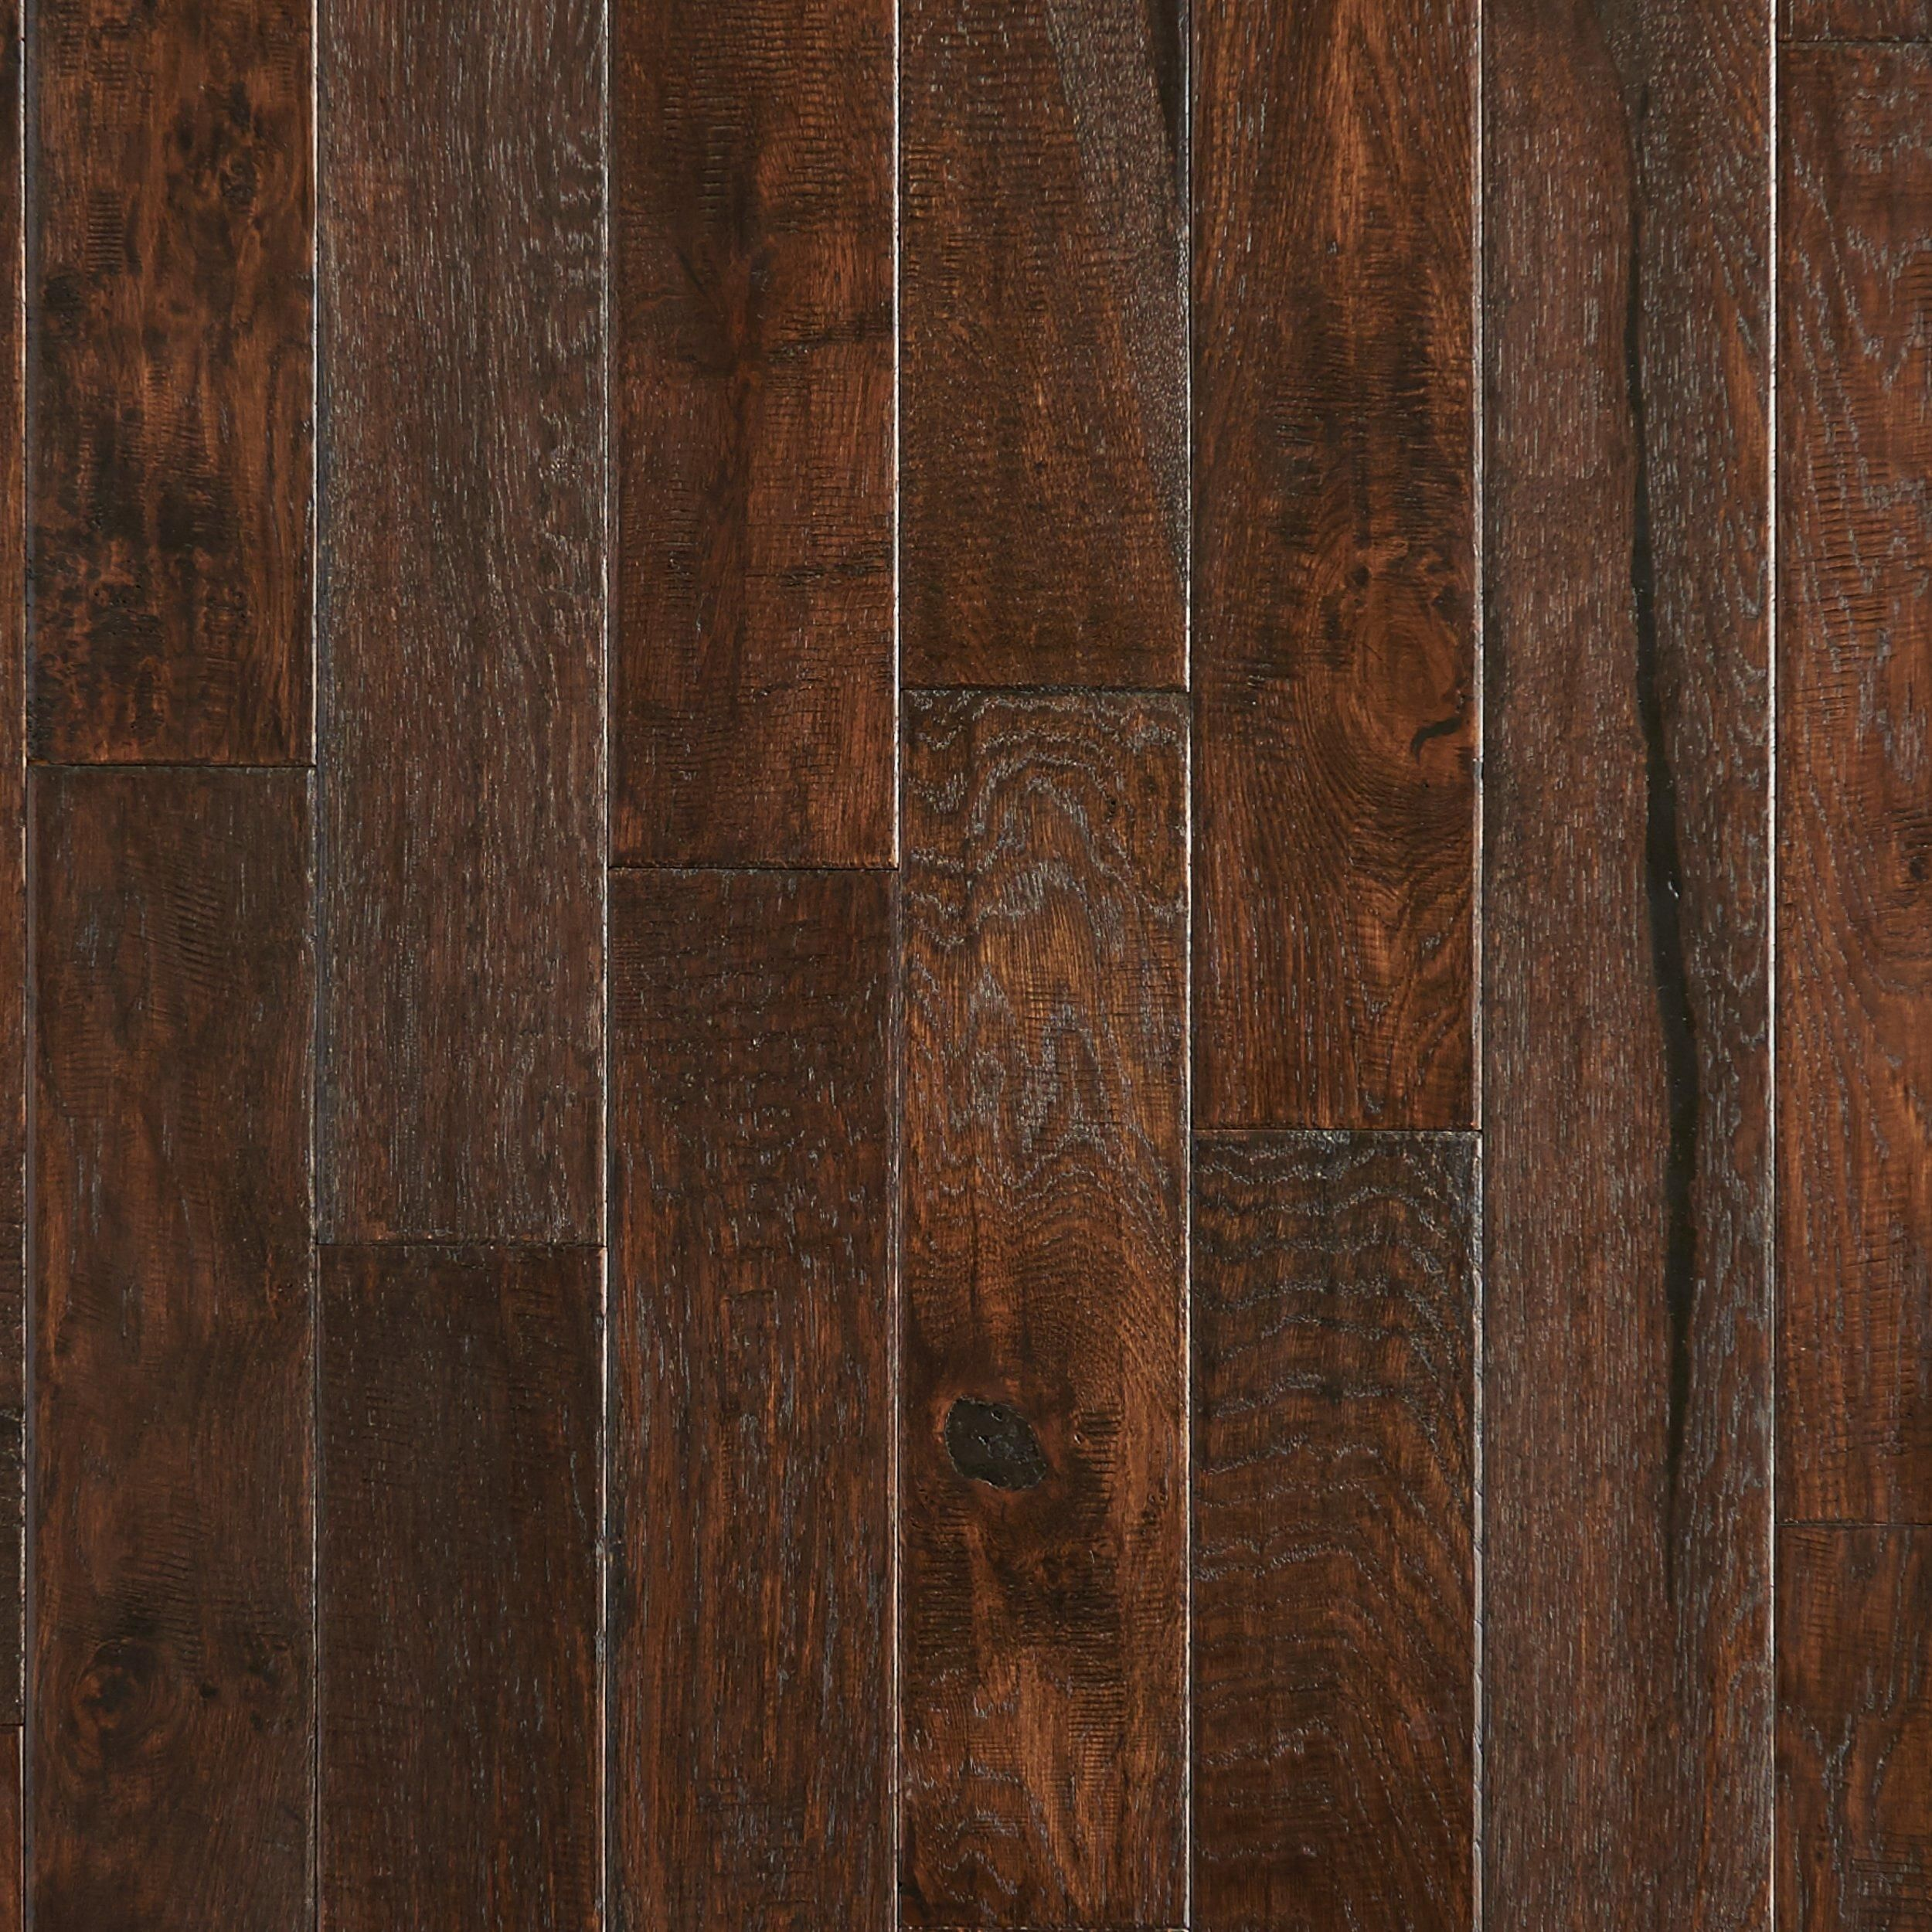 Westridge Potomac Oak Hand Scraped Solid Hardwood, 5/8